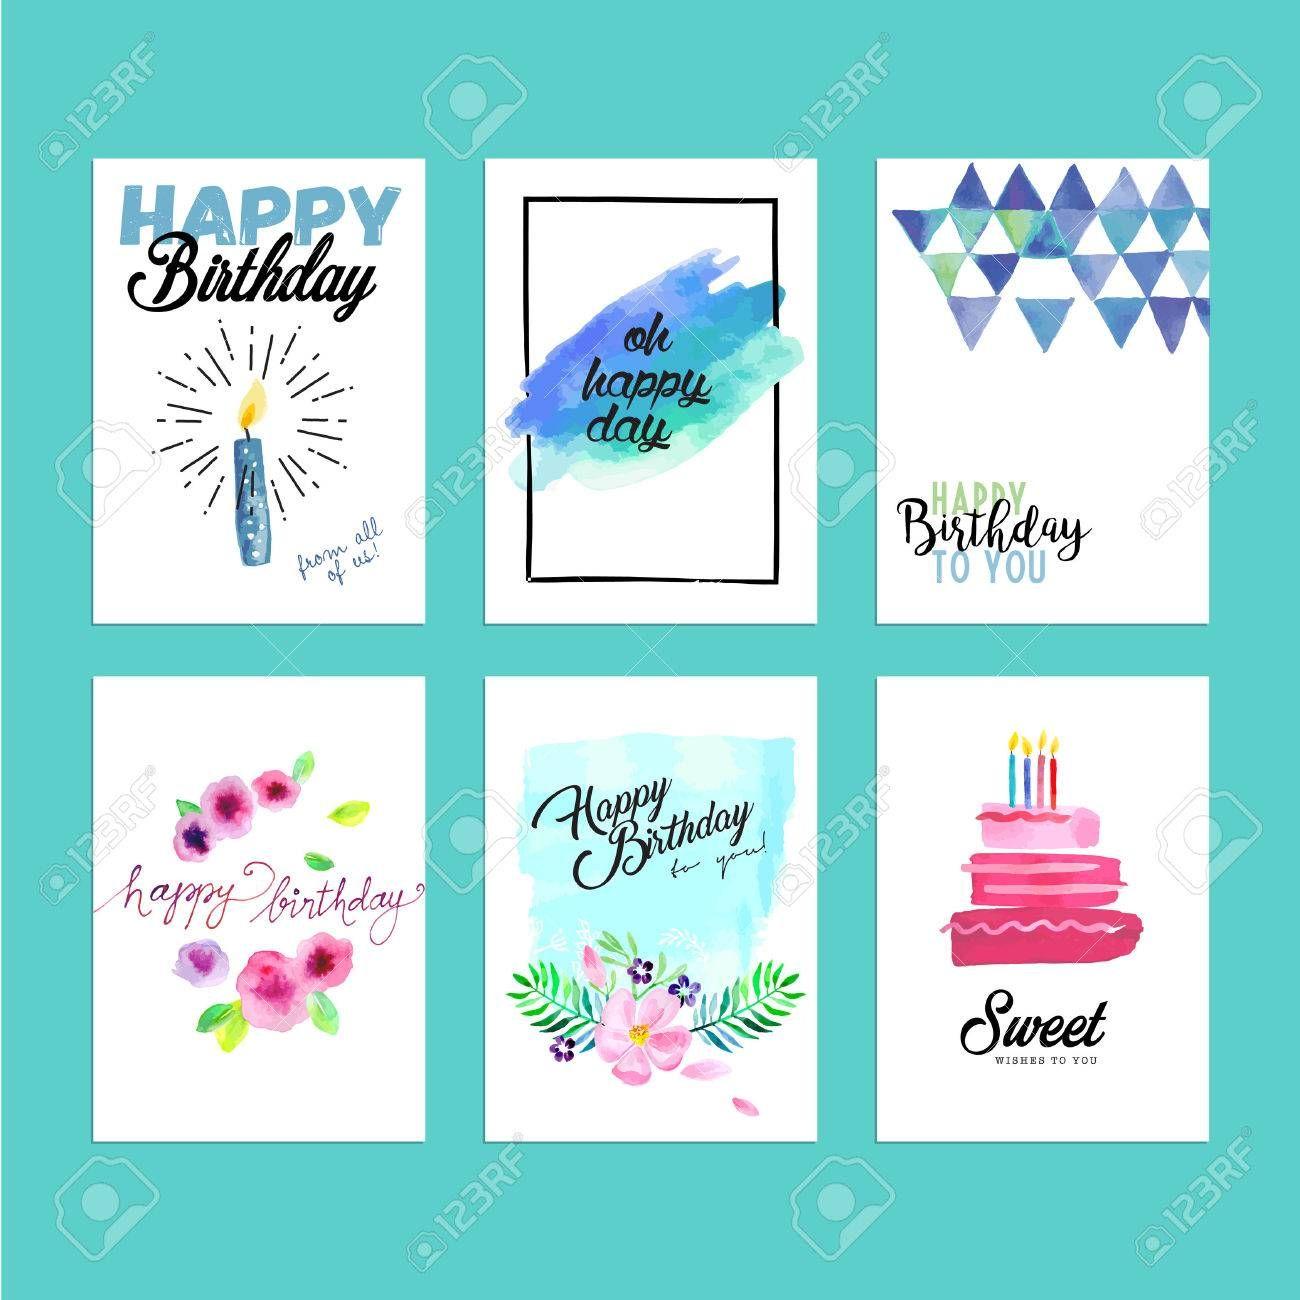 10 Top Modern Birthday Card Birthday Cards Etsy Birthday Cards Christmas Card Messages